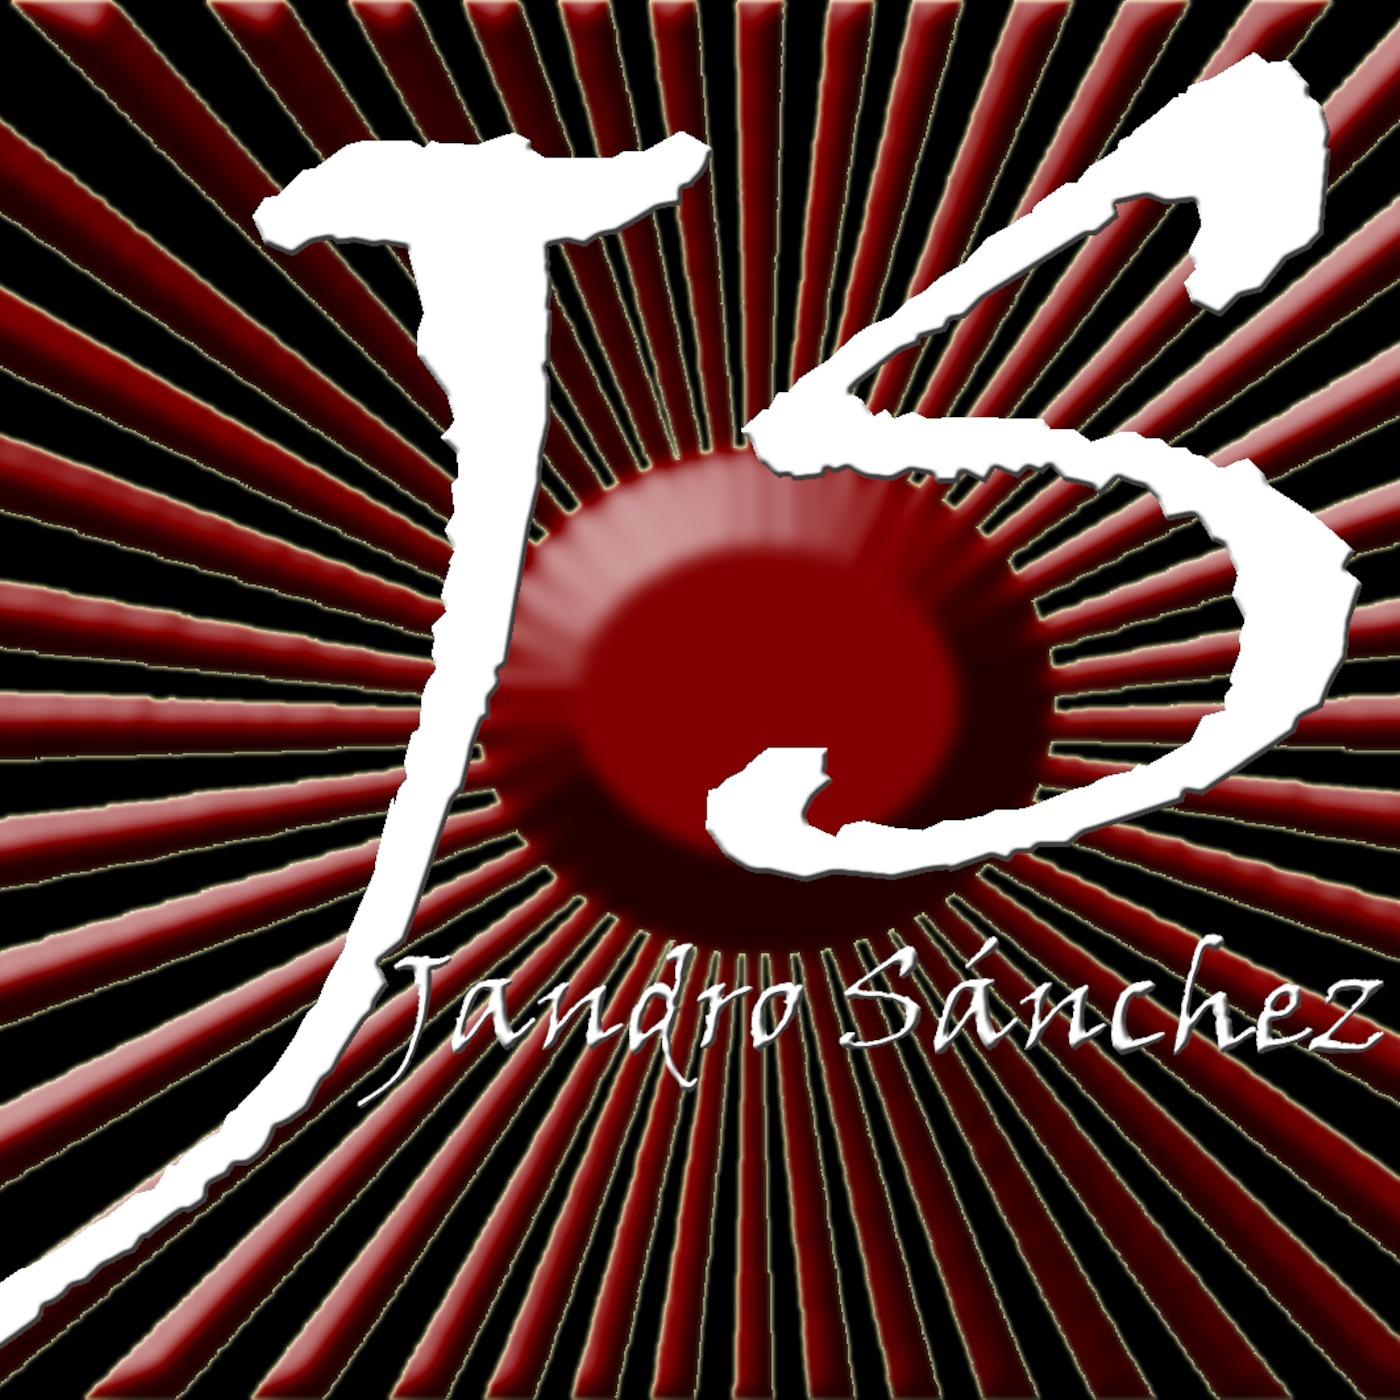 Jandro Sanchez